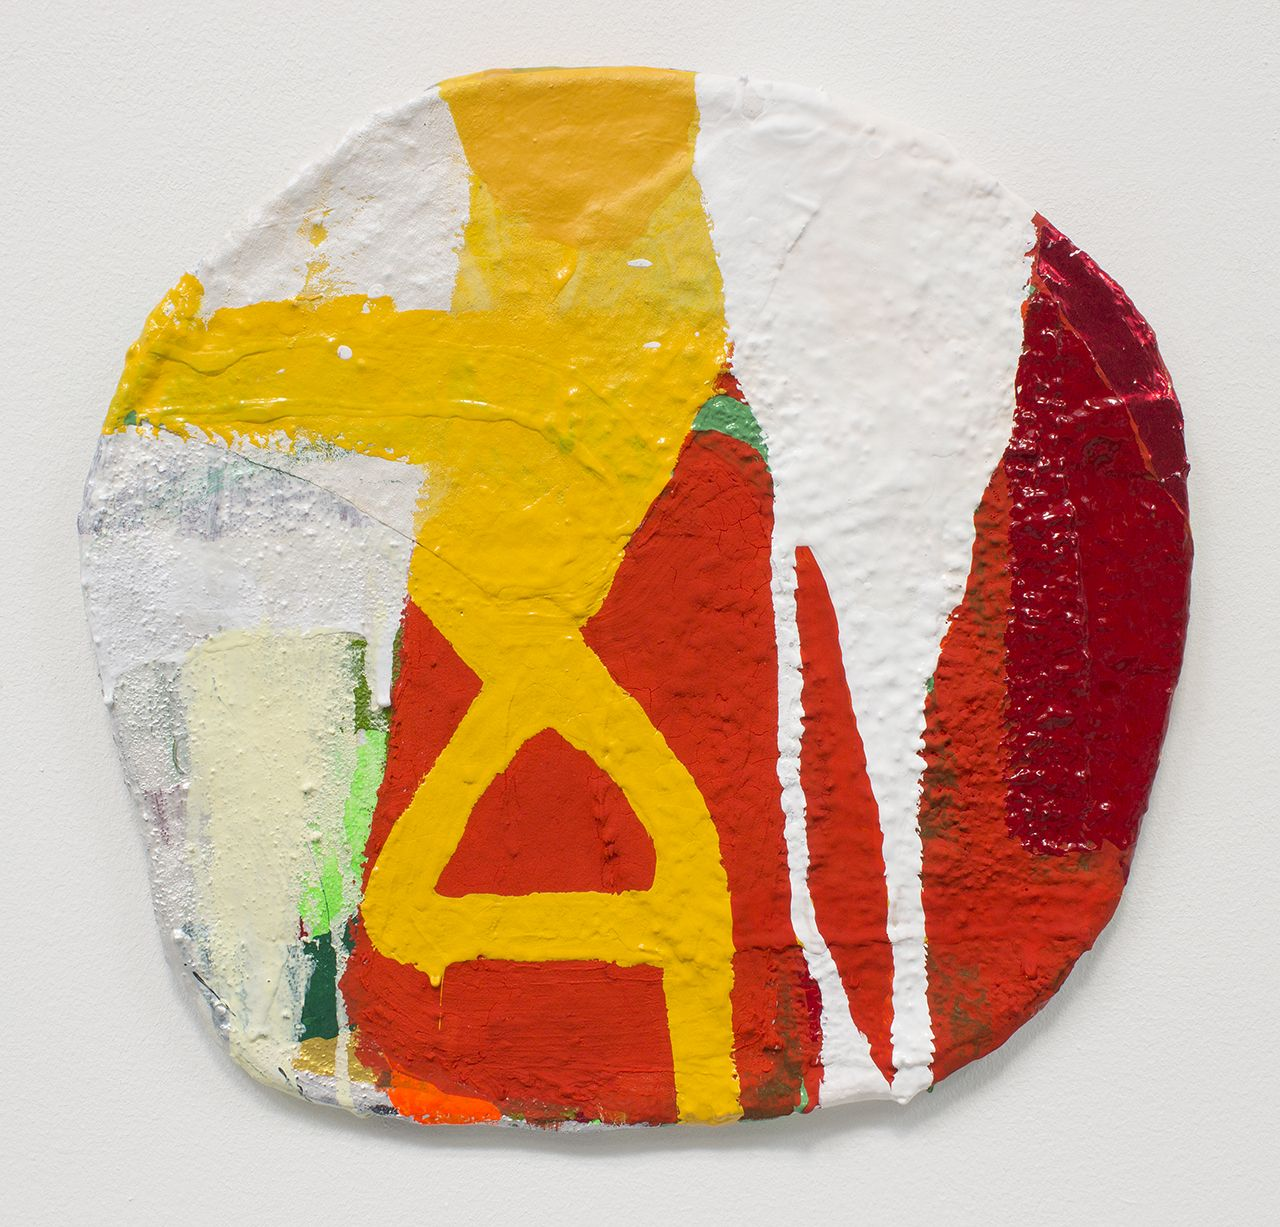 James Benjamin Franklin, Untitled, 2019,Acrylic, paper, fabric, apoxie sculpt on sealed plaster rigid wrap,